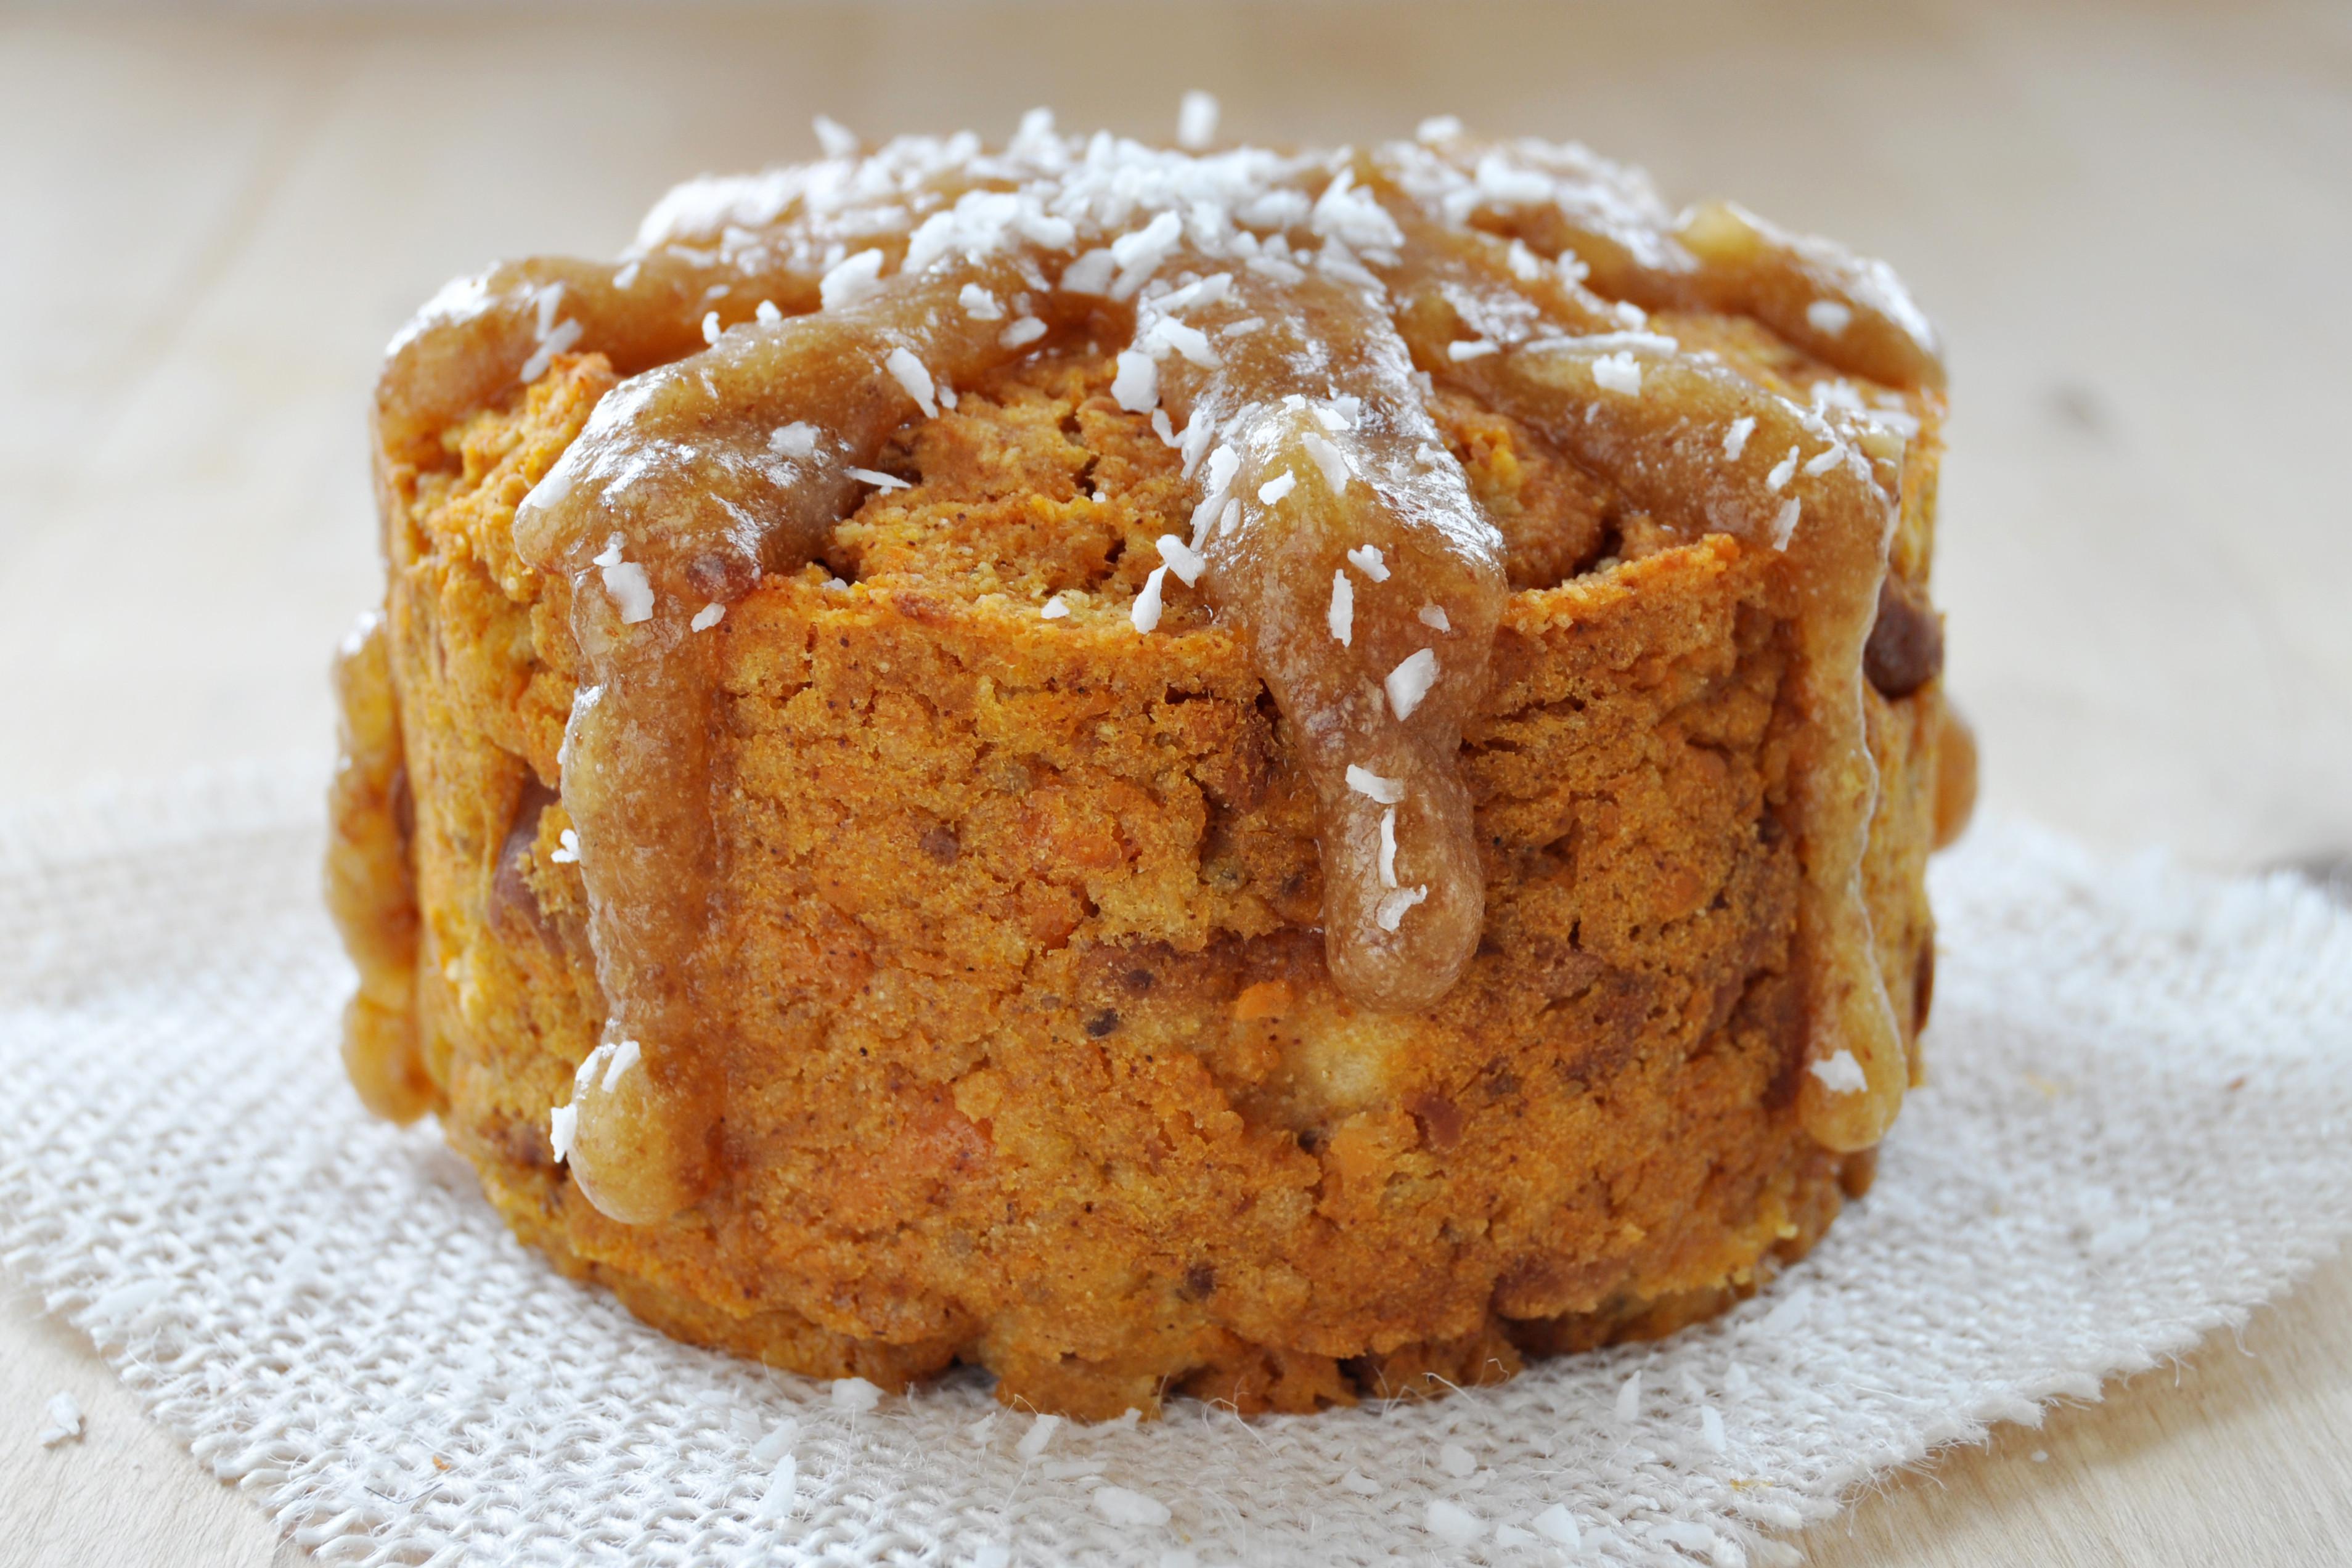 Sweet Potato Dessert Recipe  Sweet Potato Bread Pudding Caramel Sauce Vegan Gluten Free